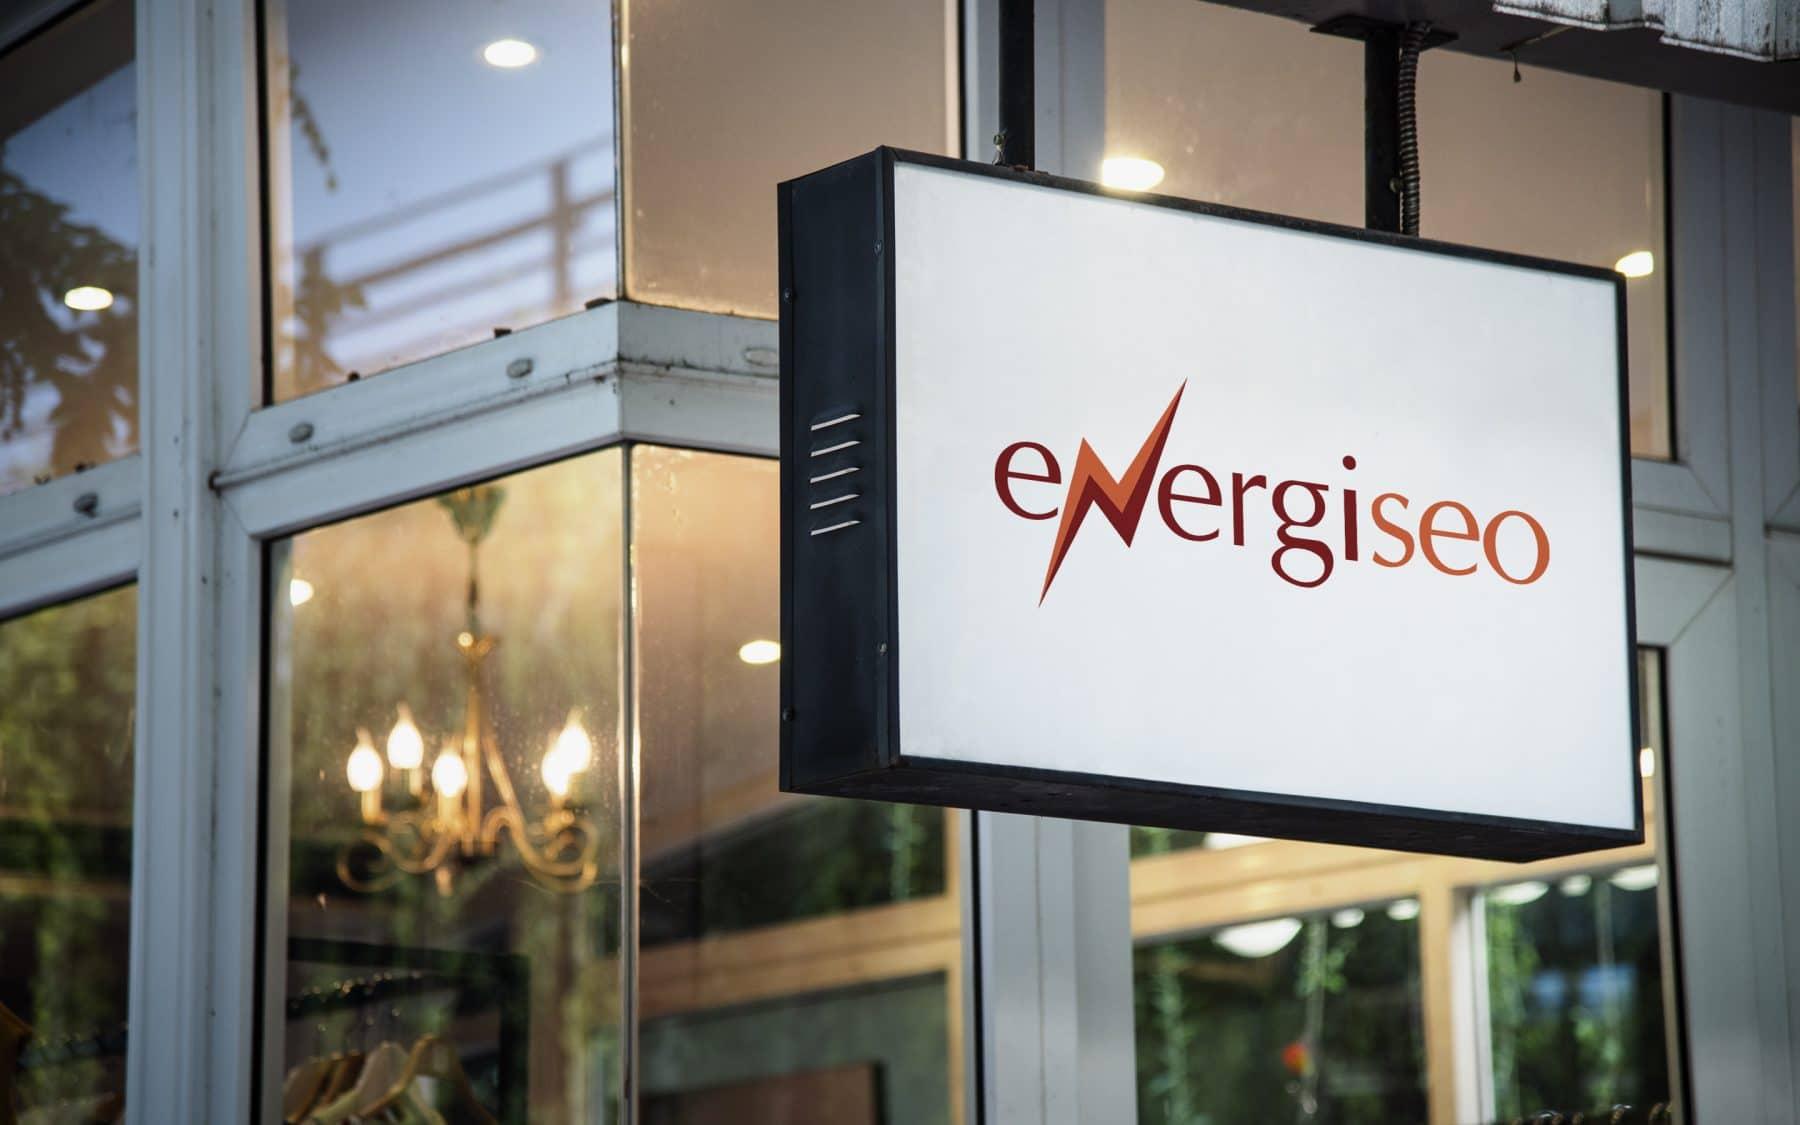 Energiseo 3